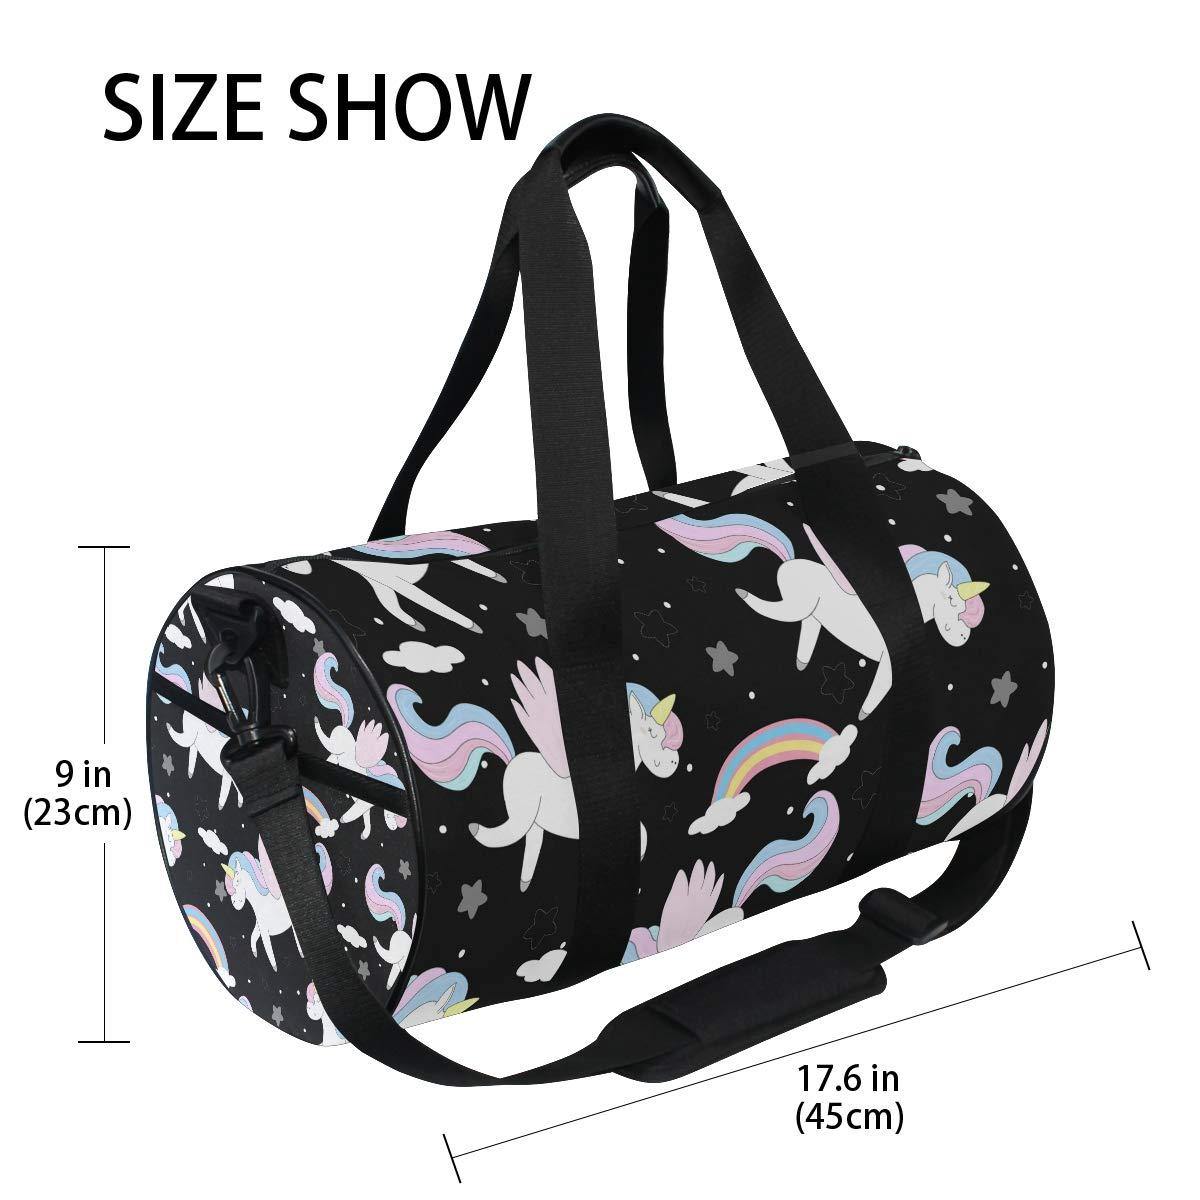 WIHVE Gym Duffel Bag Cute Cartoon Unicorn With Wings Sports Lightweight Canvas Travel Luggage Bag